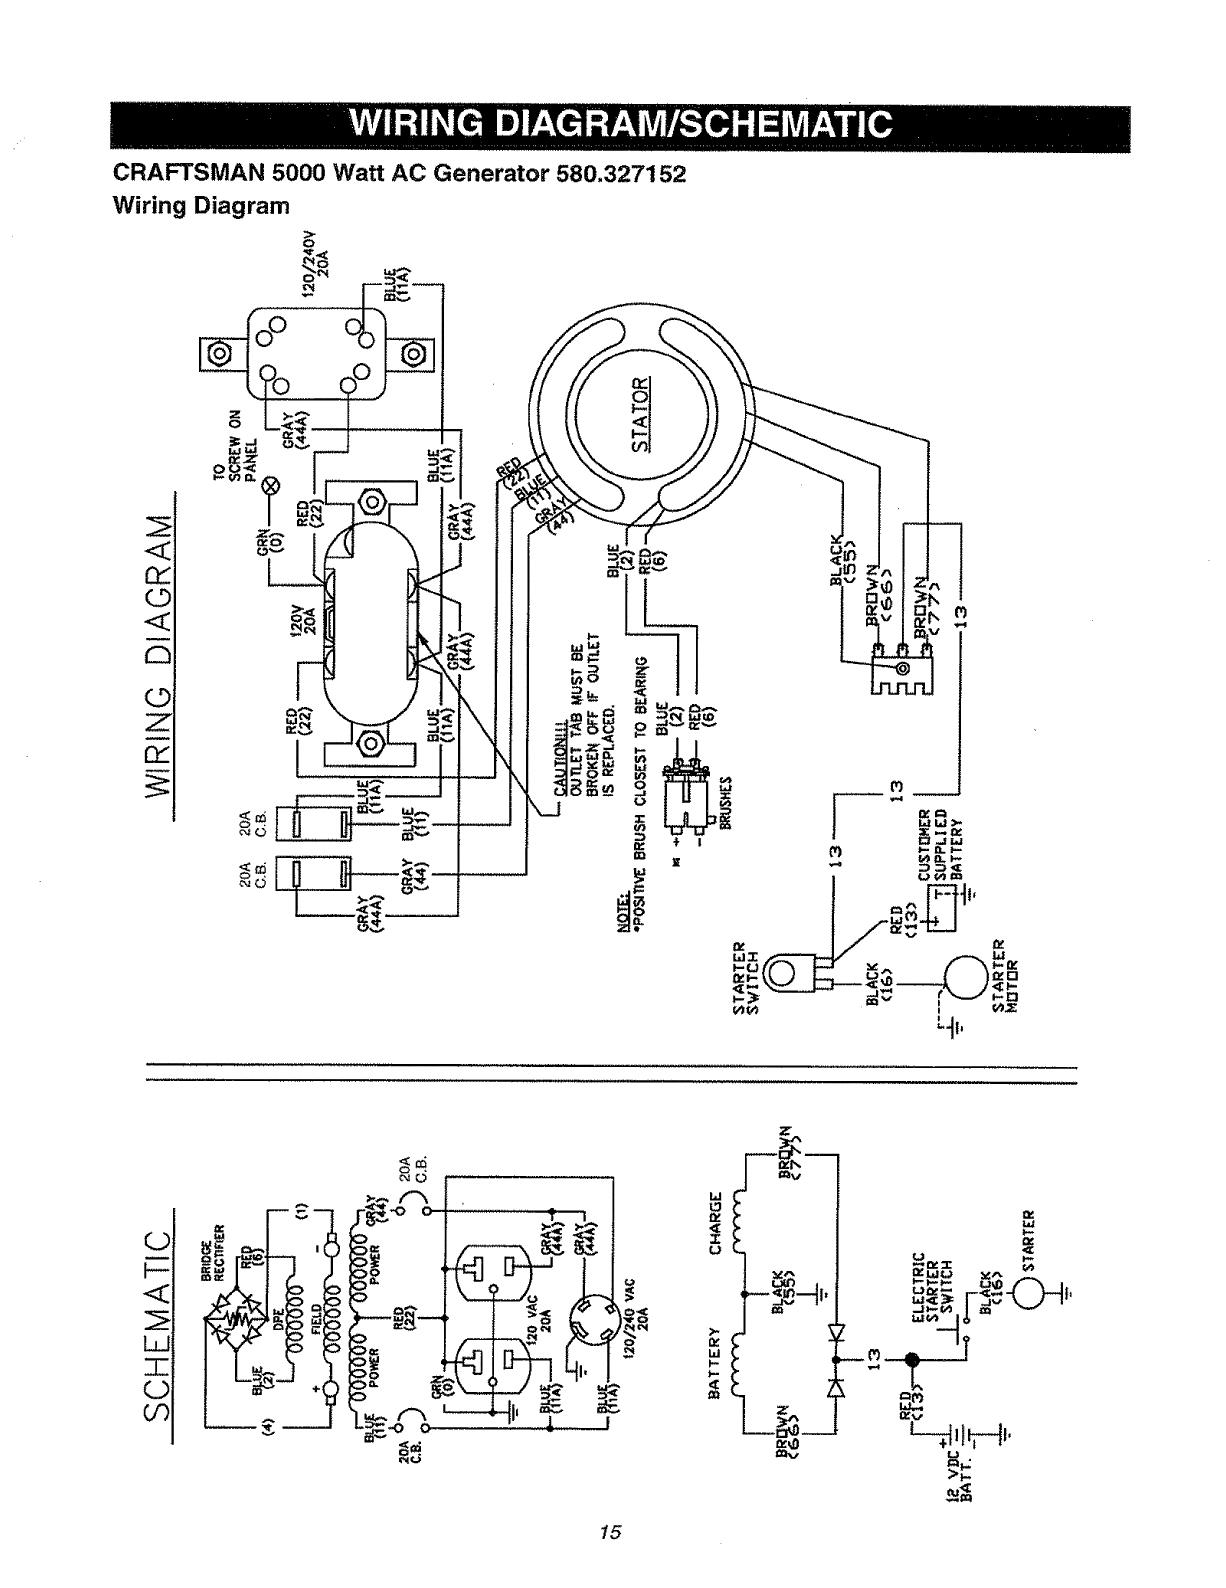 Craftsman 580327150 User Manual 2400 WATT PORTABLE AC